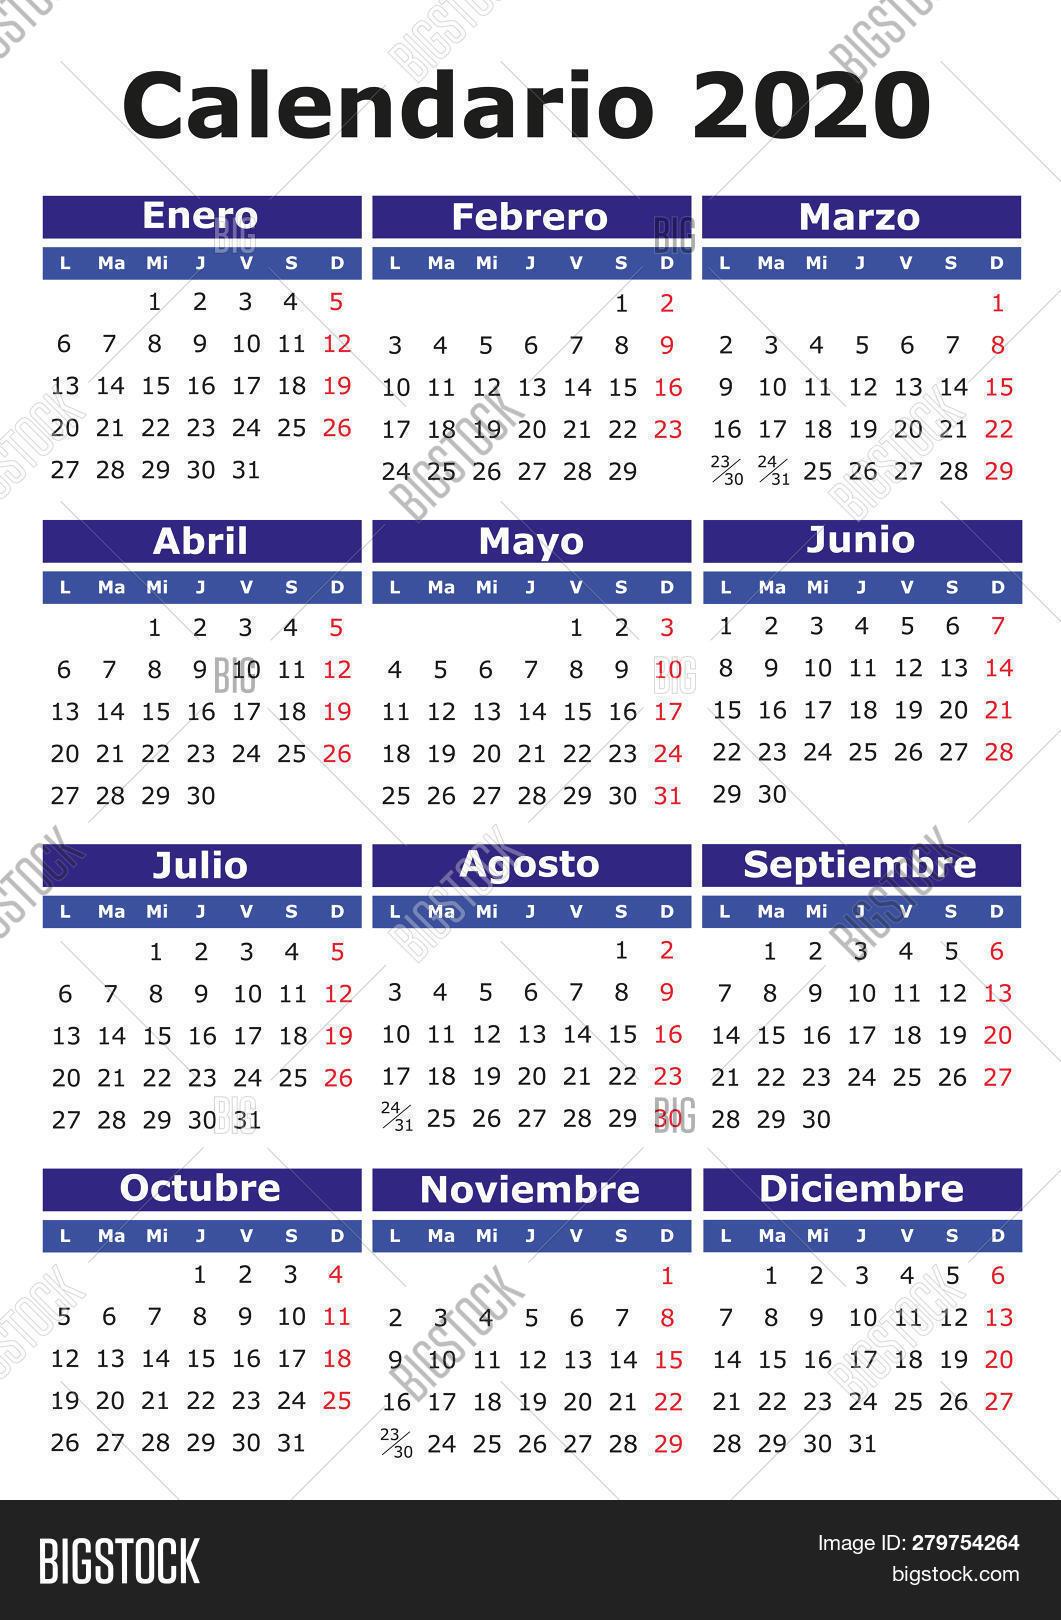 Calendario Scolastico 2020 17 Campania.Calendario 2020 Free